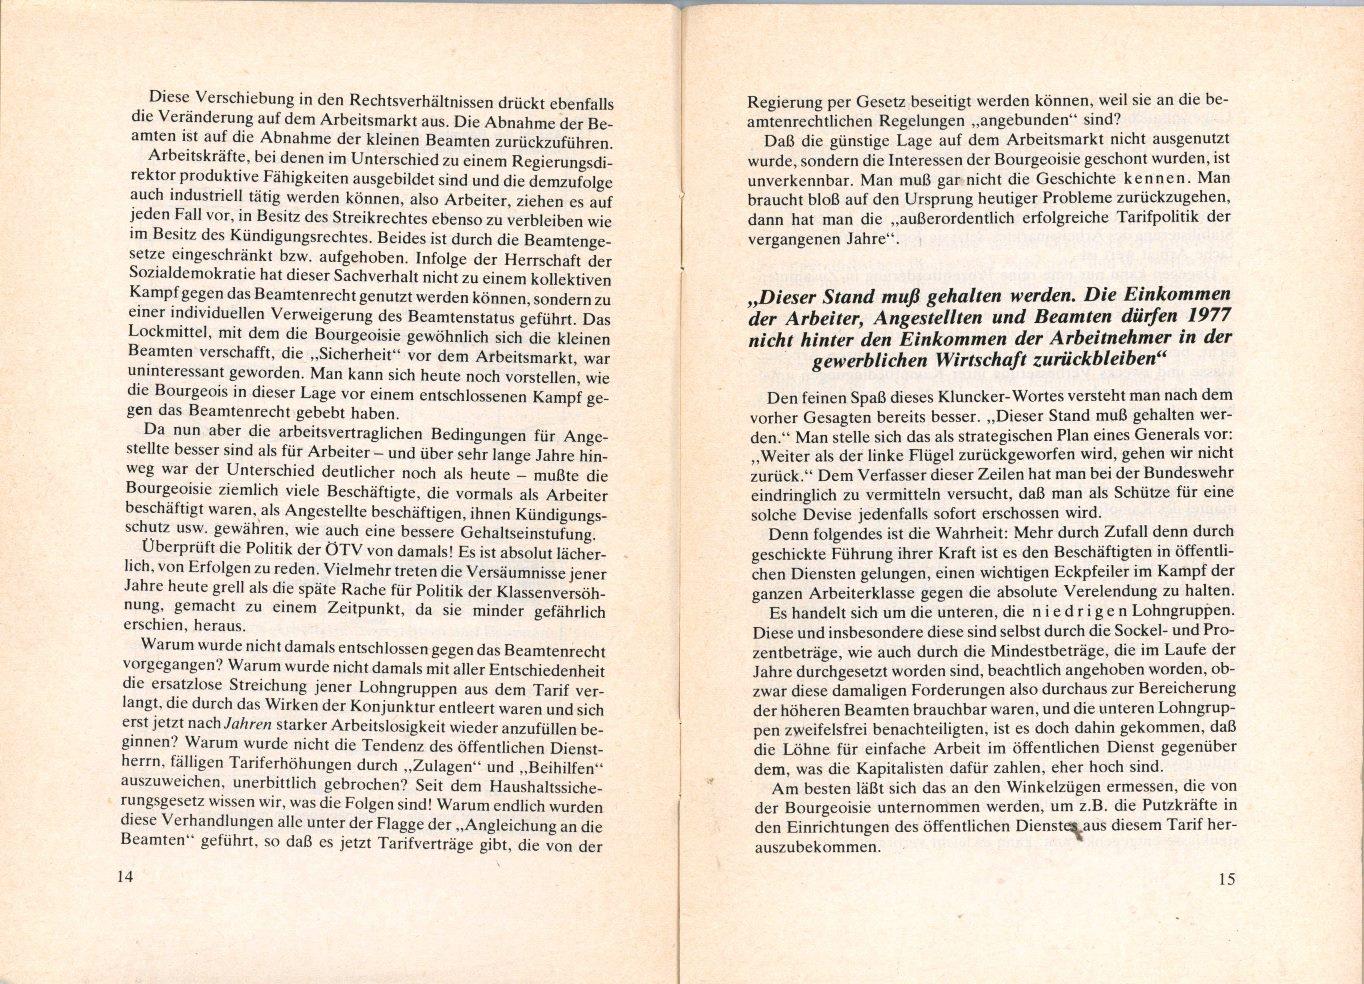 OTV_KBW_Klassenversoehnung_1976_08